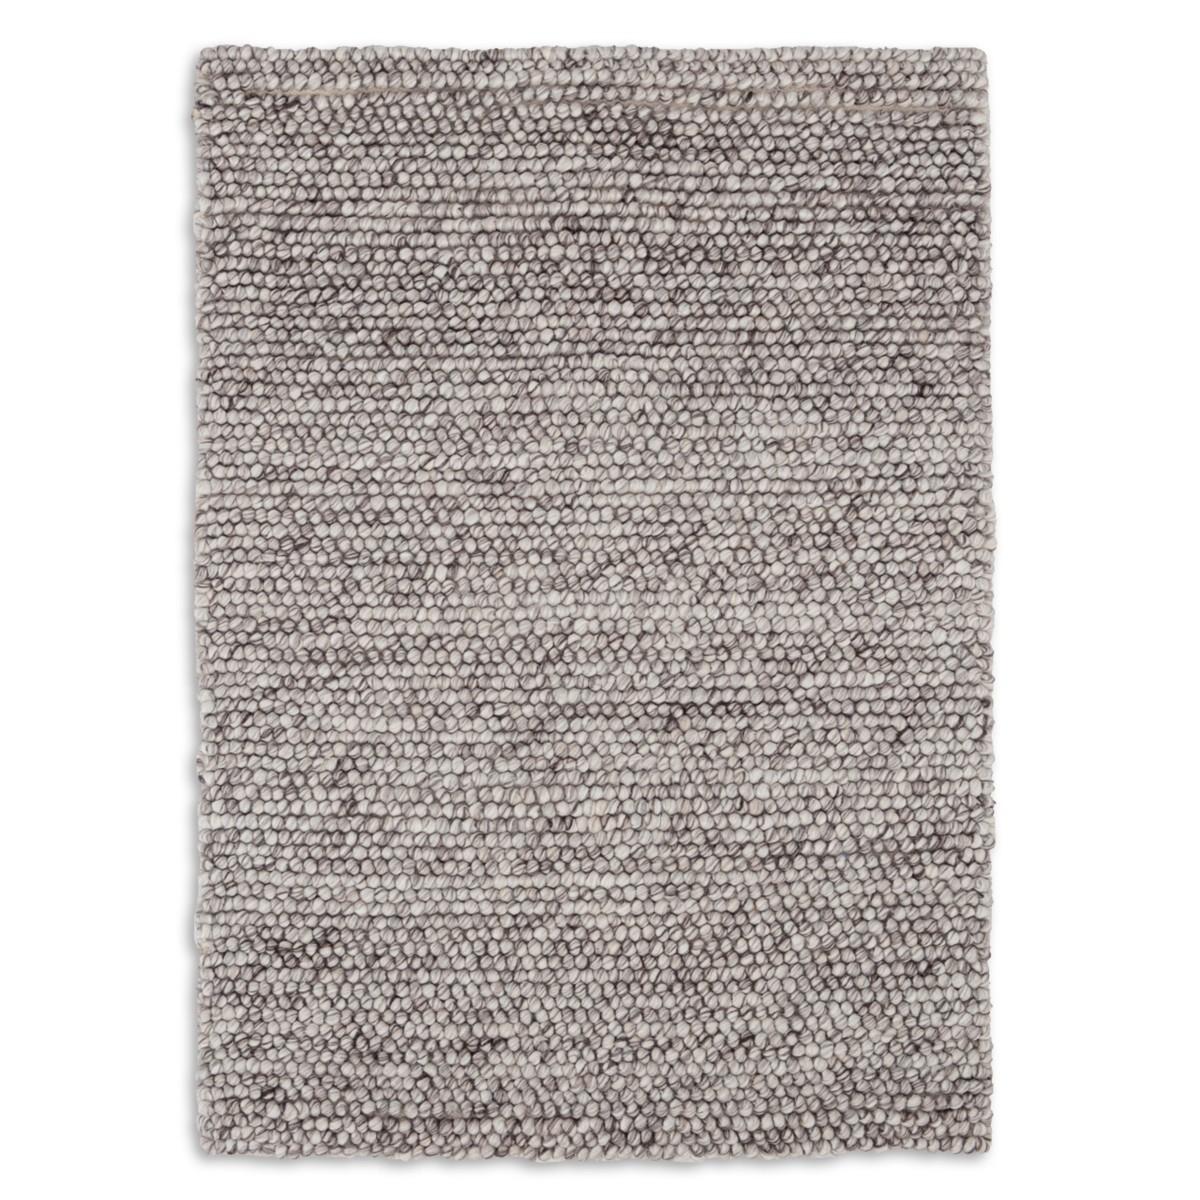 Niels Woven Wool/Viscose Rug - Grey